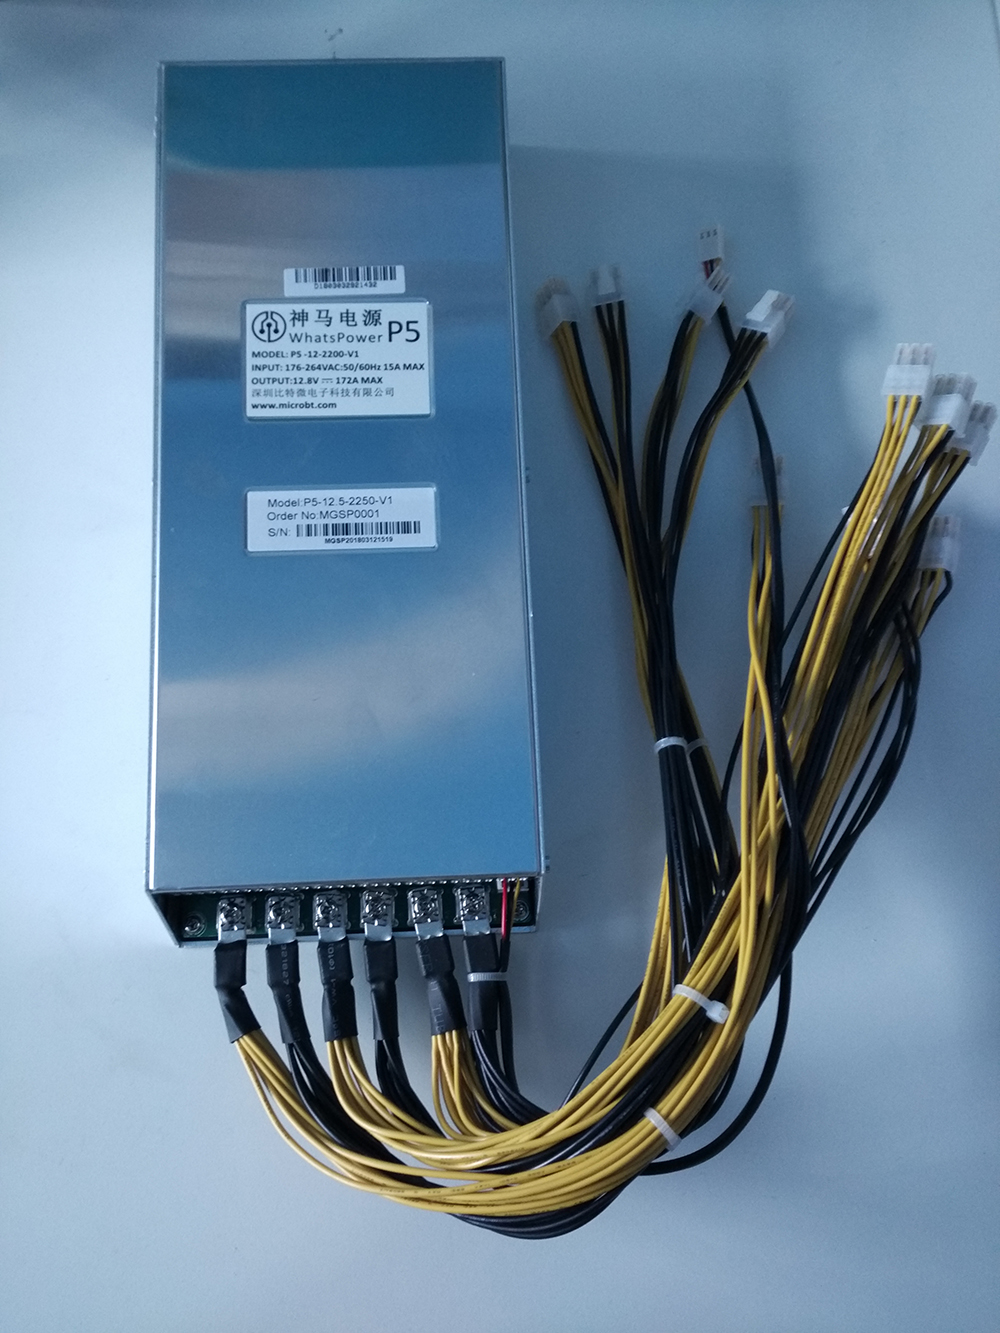 Original Whatspower P5 Power Supply 6pin10 2200w Psu For Whatsminer Electricitypage2 Qq20180427111744 Qq20180427111756 Qq20180427111803 Qq20180427111823 Qq20180427111751